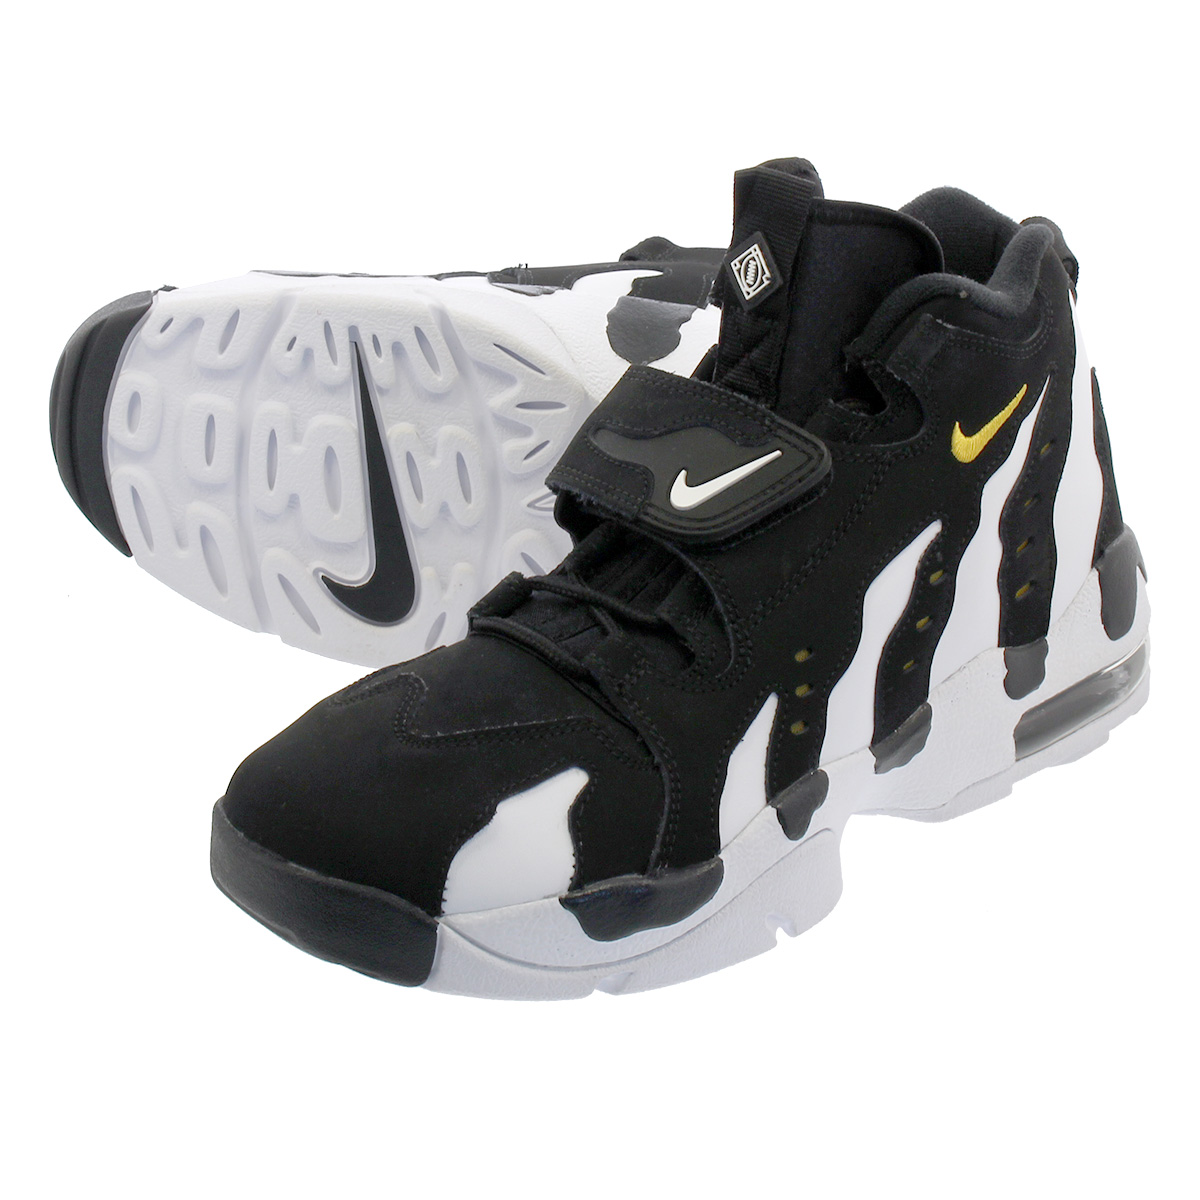 promo code 8250e 0c3da NIKE AIR DT MAX 96 Nike air DT max 96 BLACK WHITE VARSITY MAZE ...